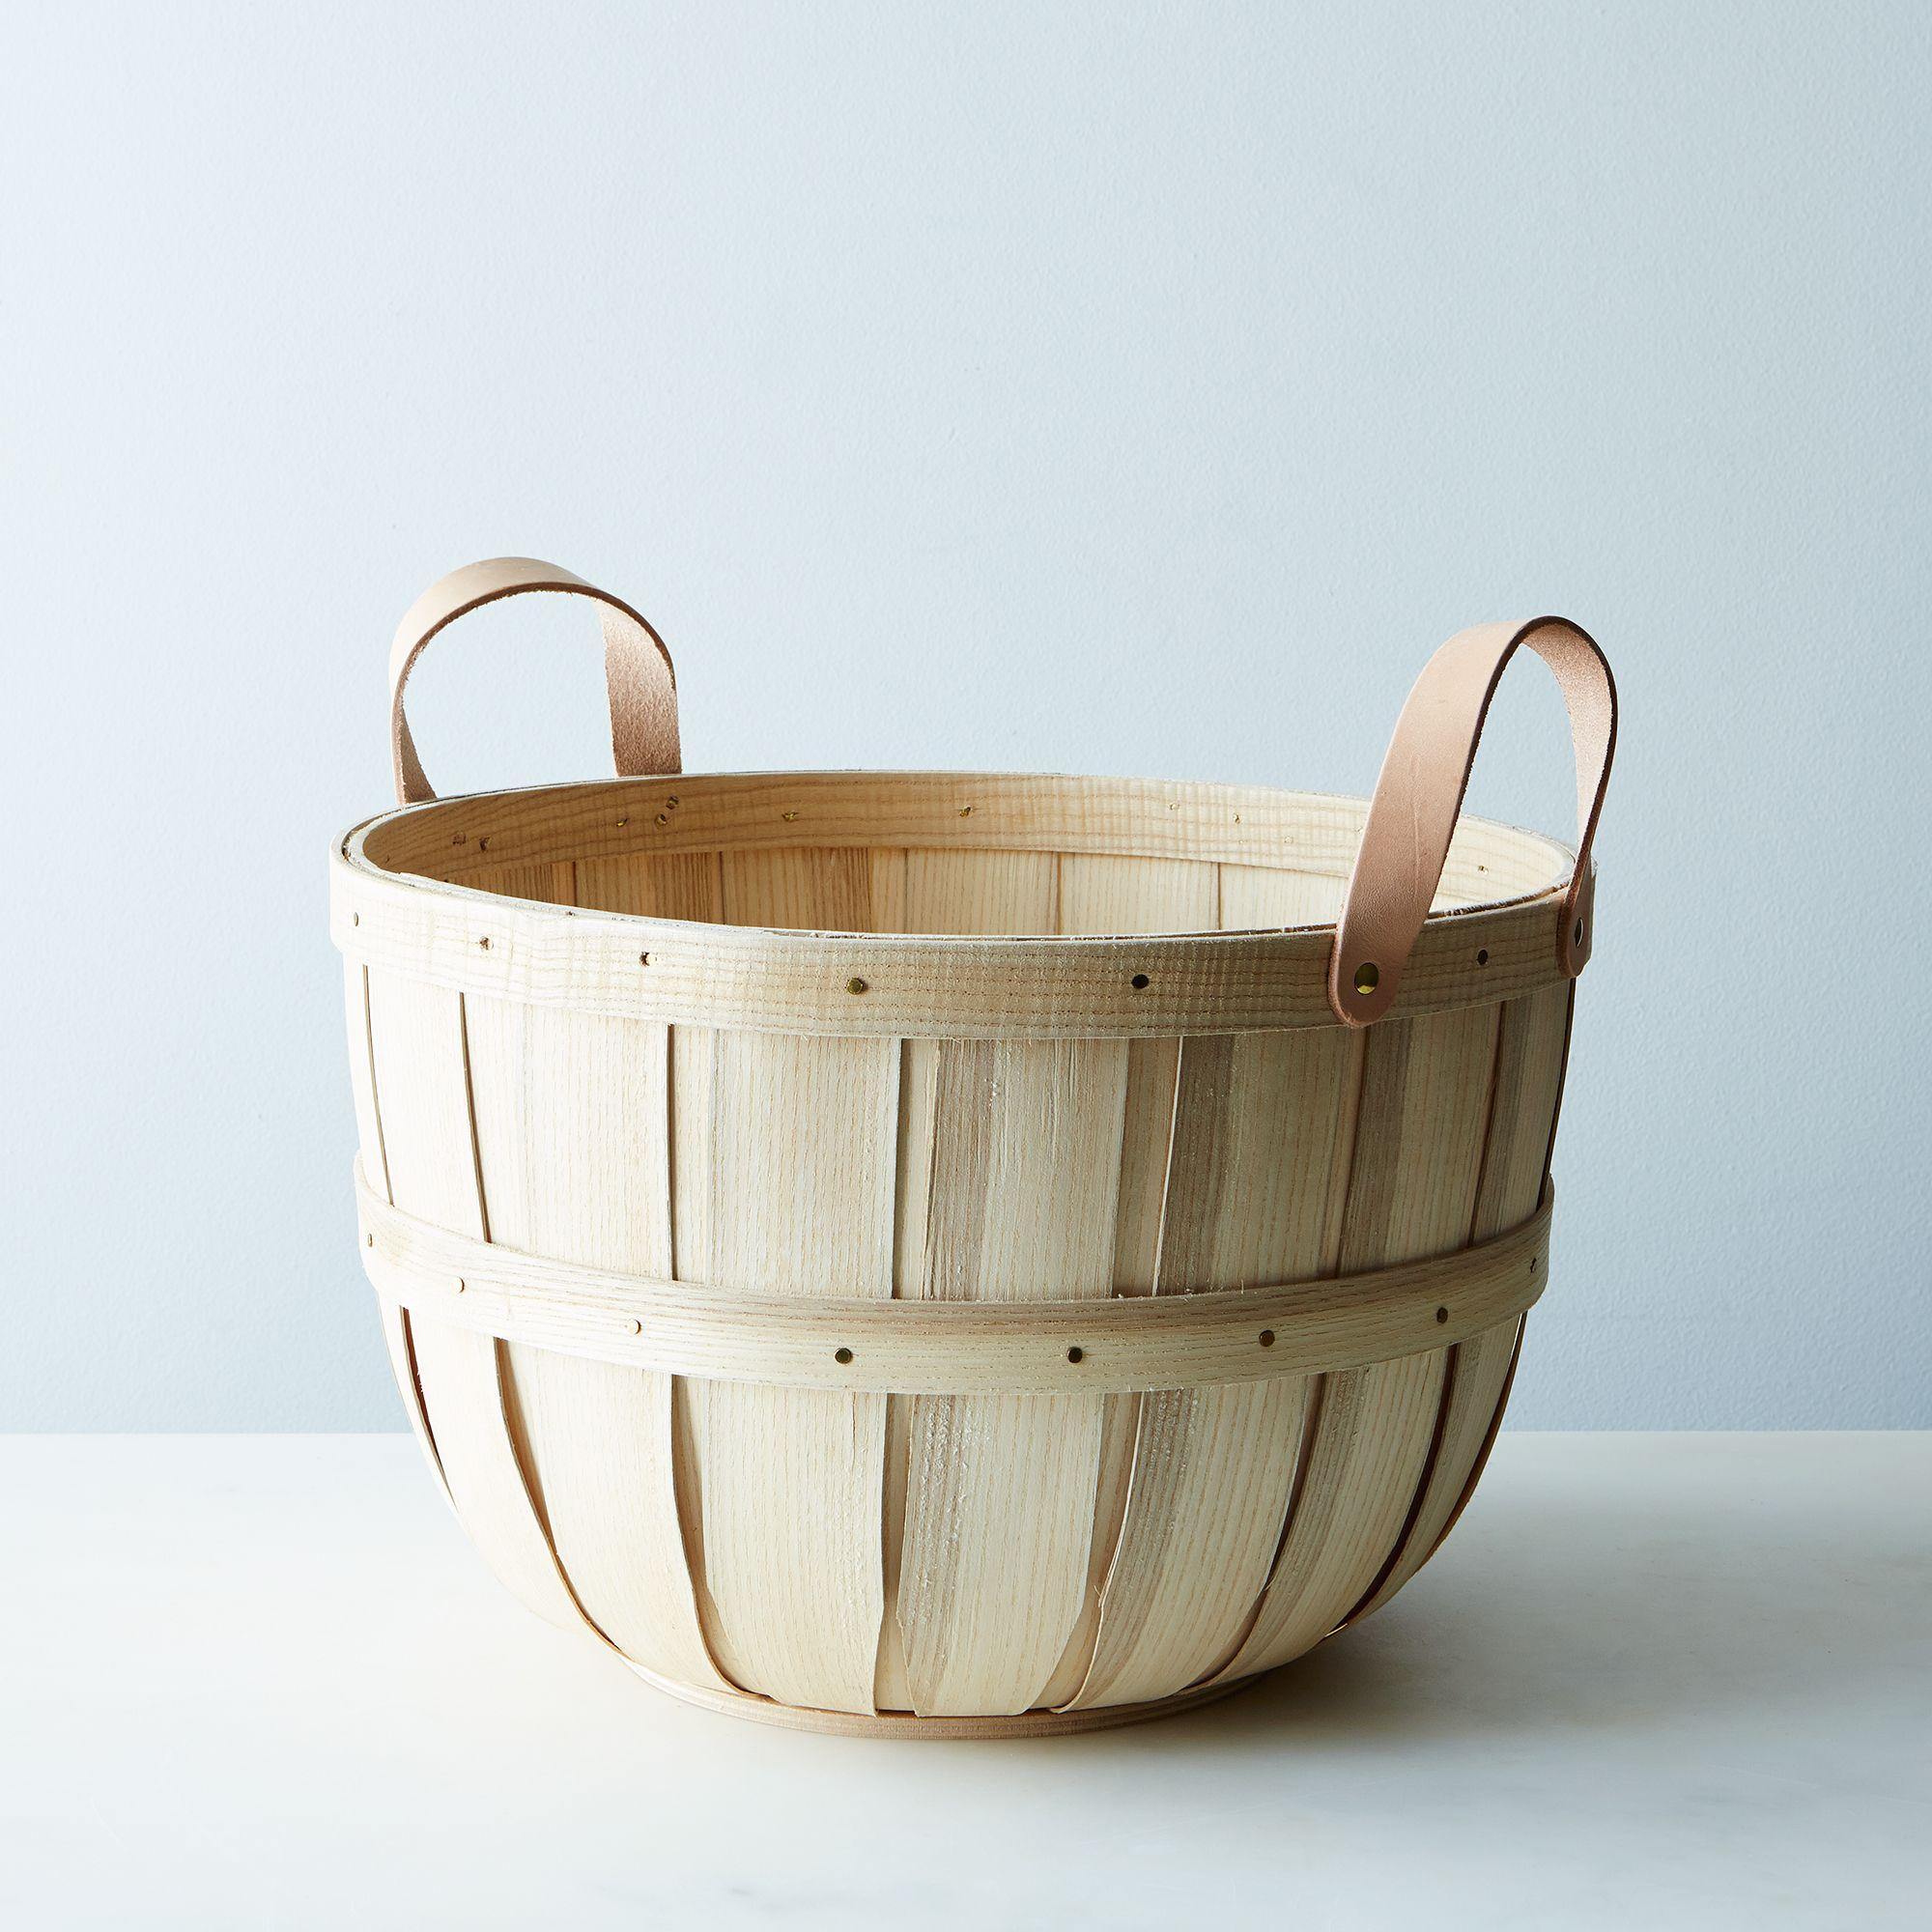 Half Bushel & Peck Baskets - Half Bushel